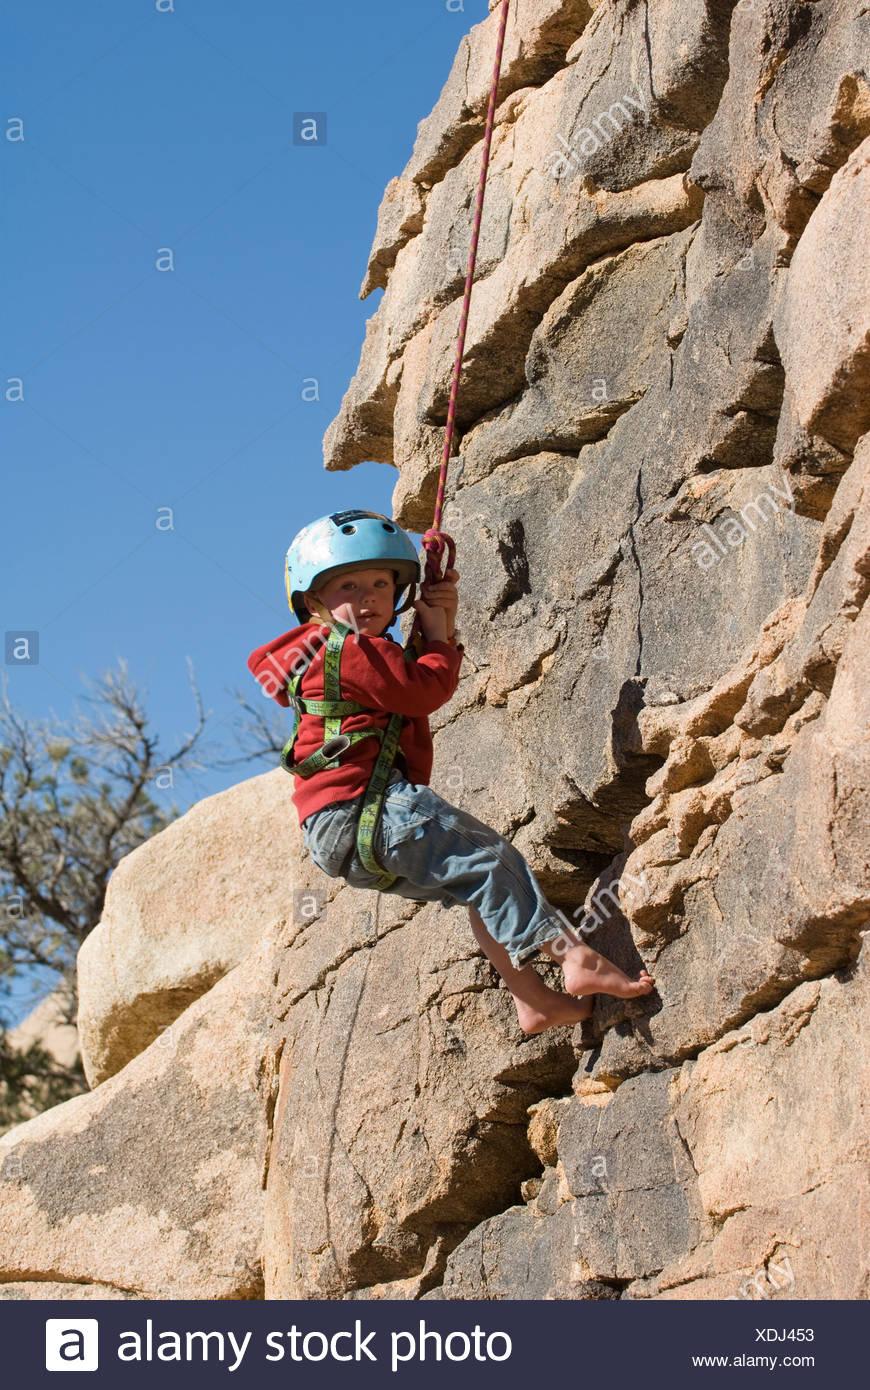 Boy rappelling cliff face, Joshua Tree National Park, California. - Stock Image